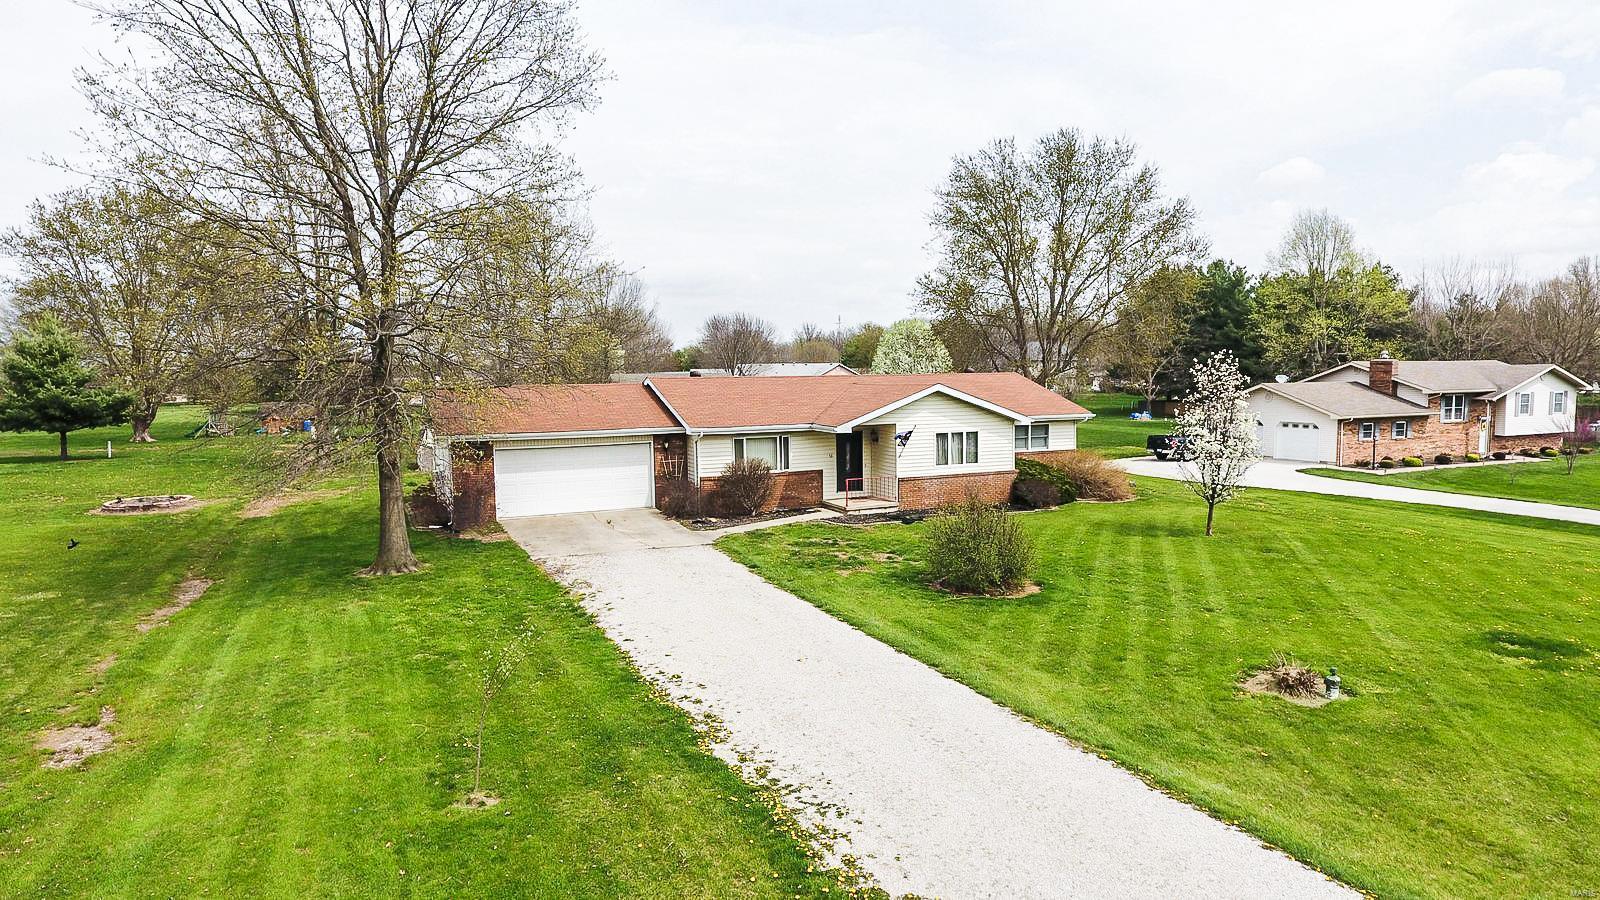 33 Horseshoe Lane Property Photo - Litchfield, IL real estate listing